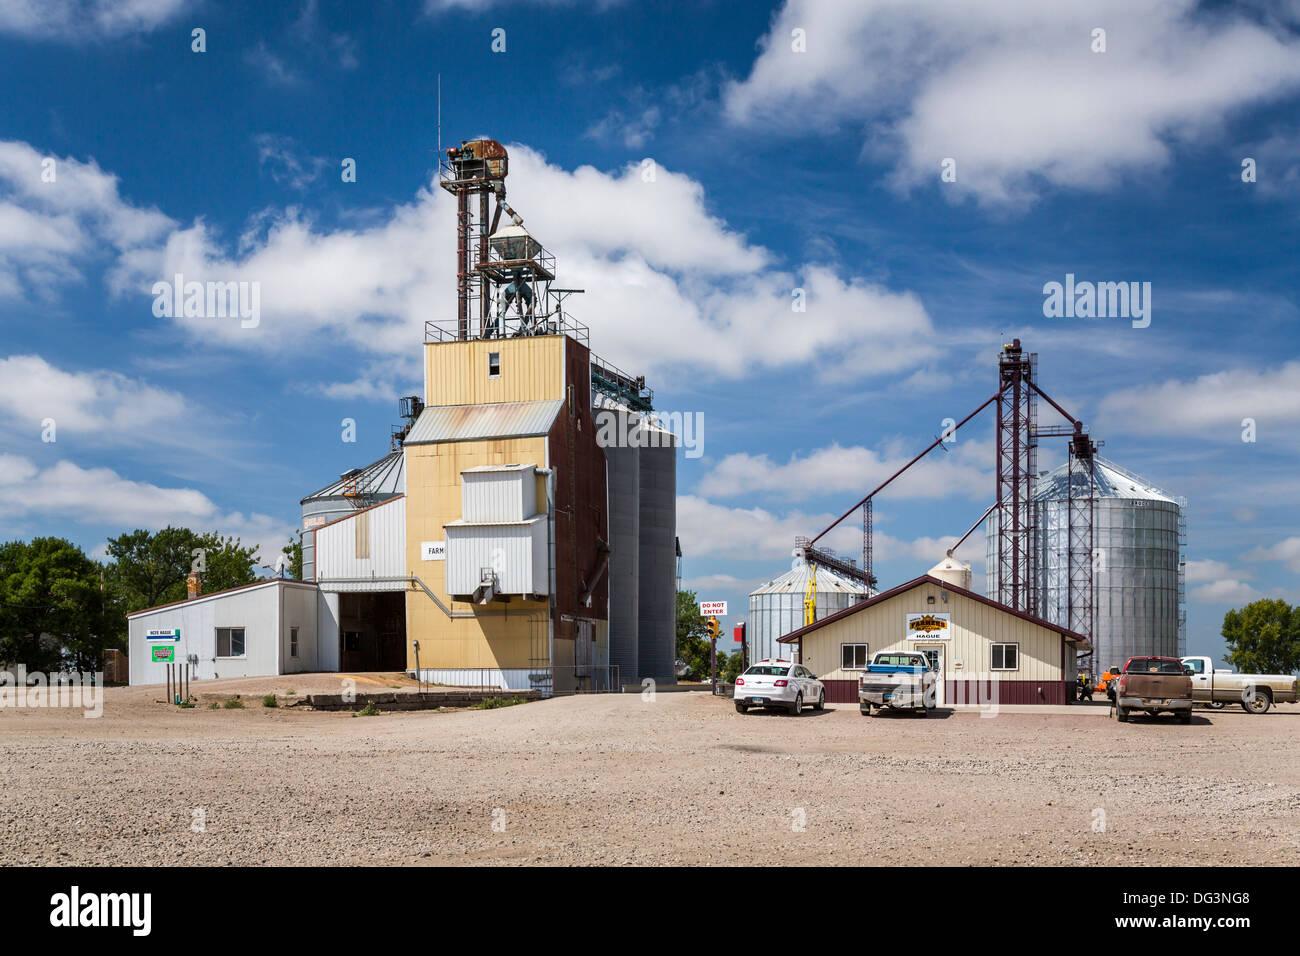 An elevator and grain storage bins at Hague, North Dakota, USA. - Stock Image